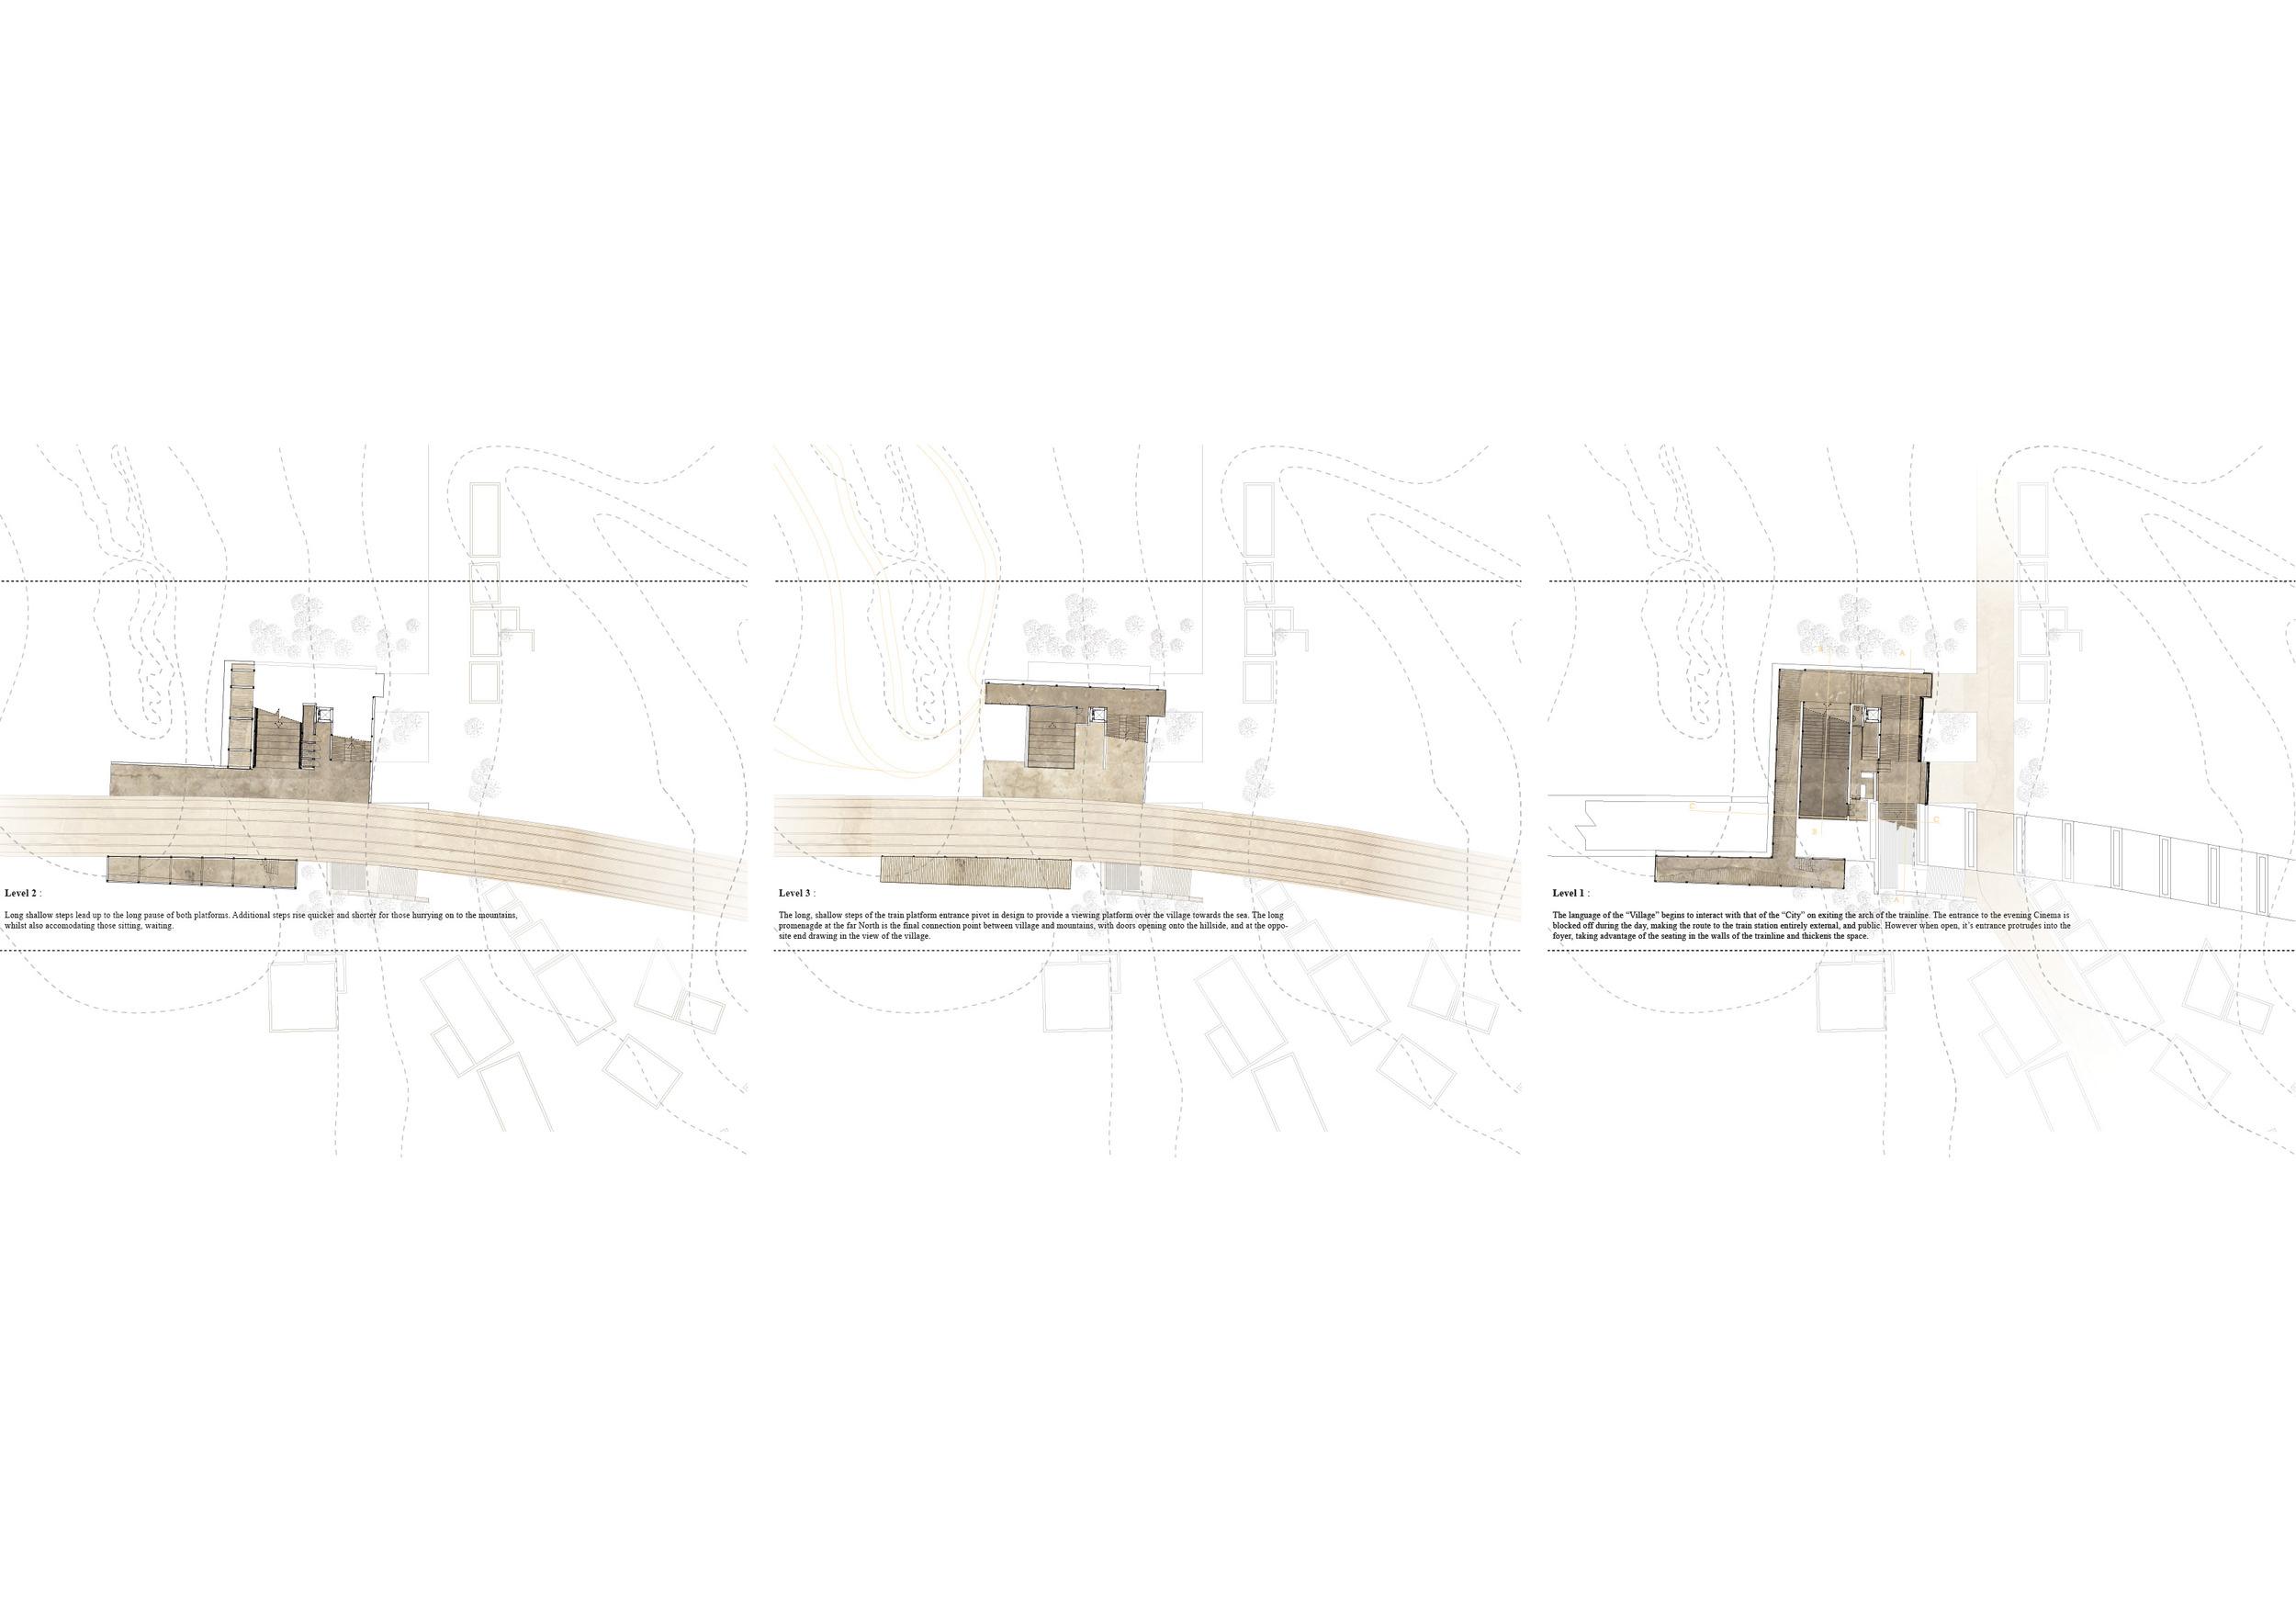 site plans : level 3, level 4, level 5